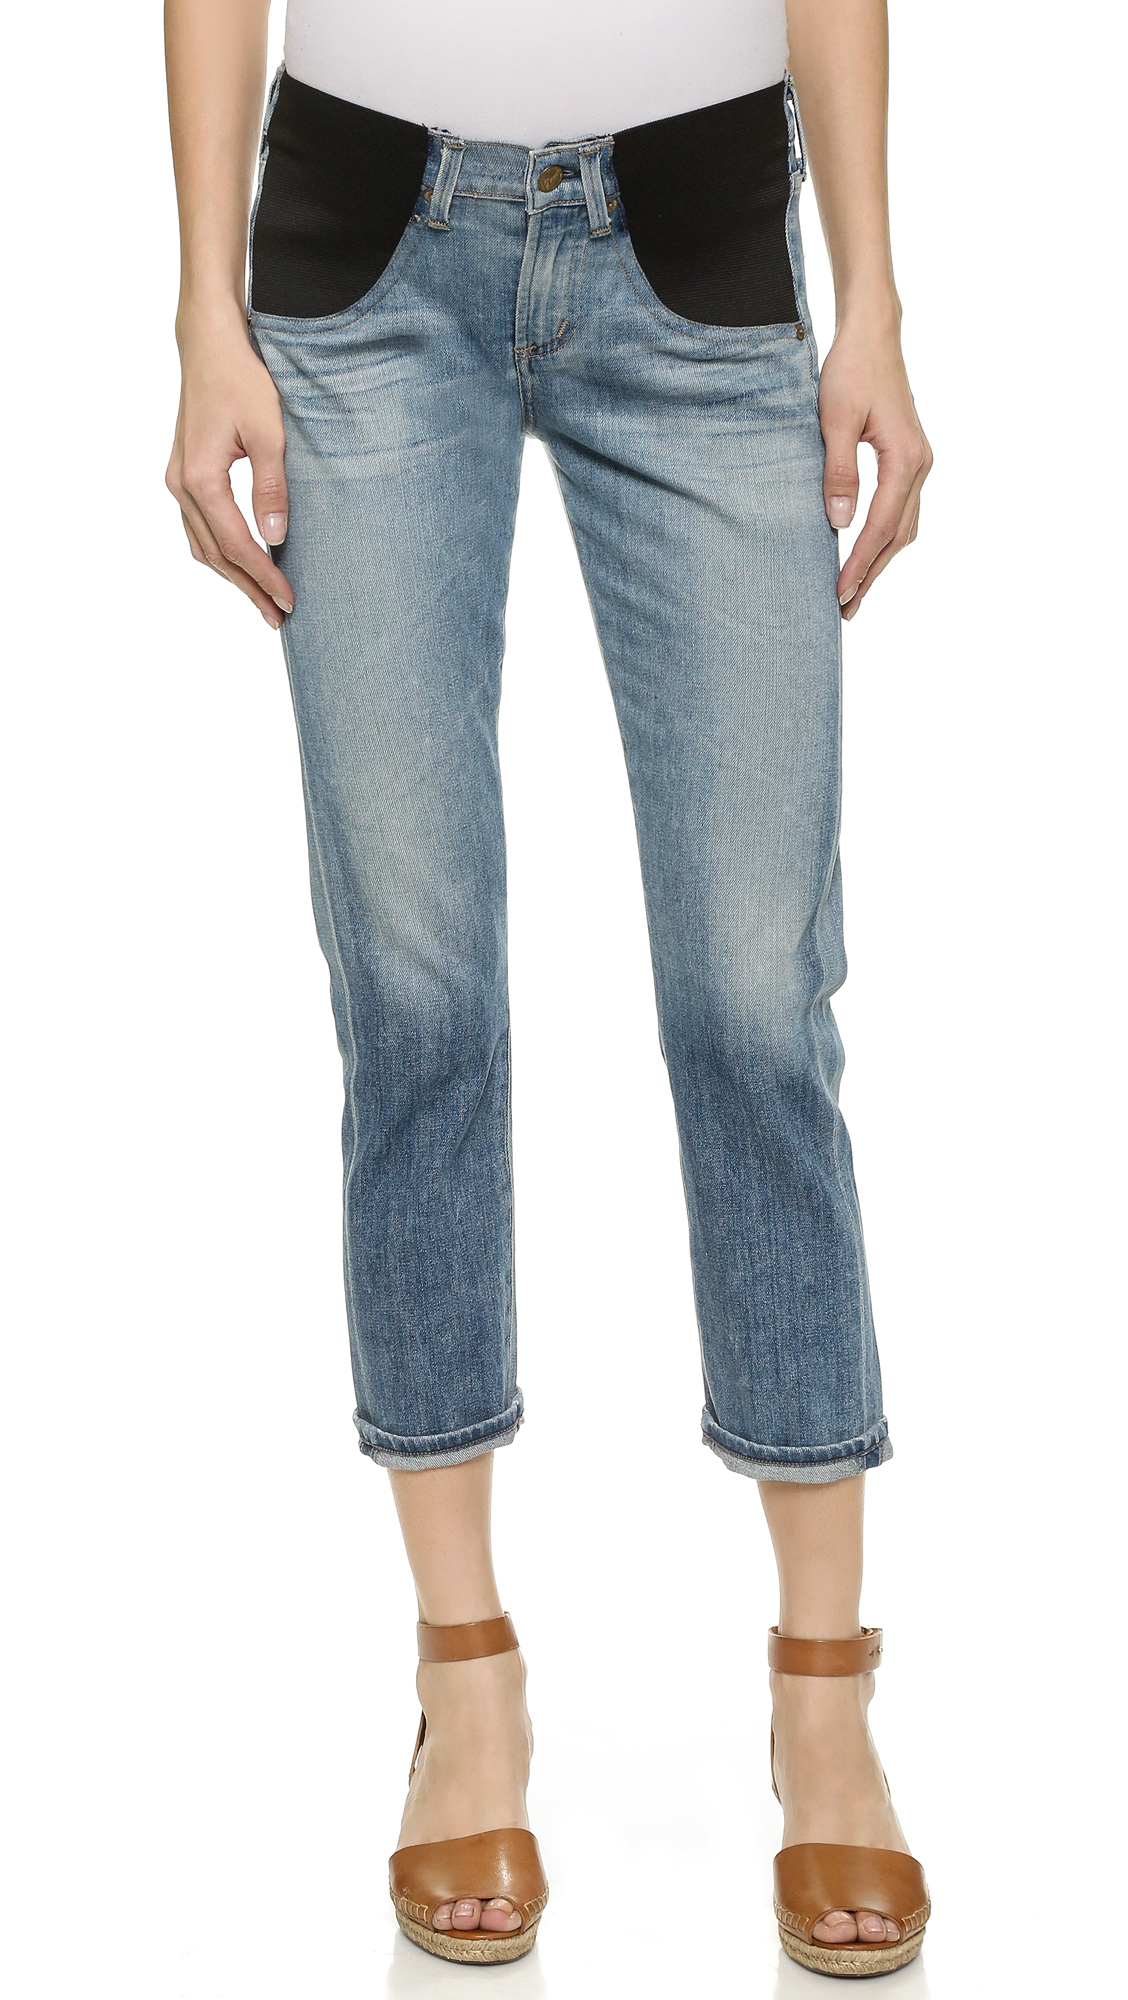 e8aba66b69f62 Citizens of Humanity Emerson Slim Boyfriend Maternity Jeans ...